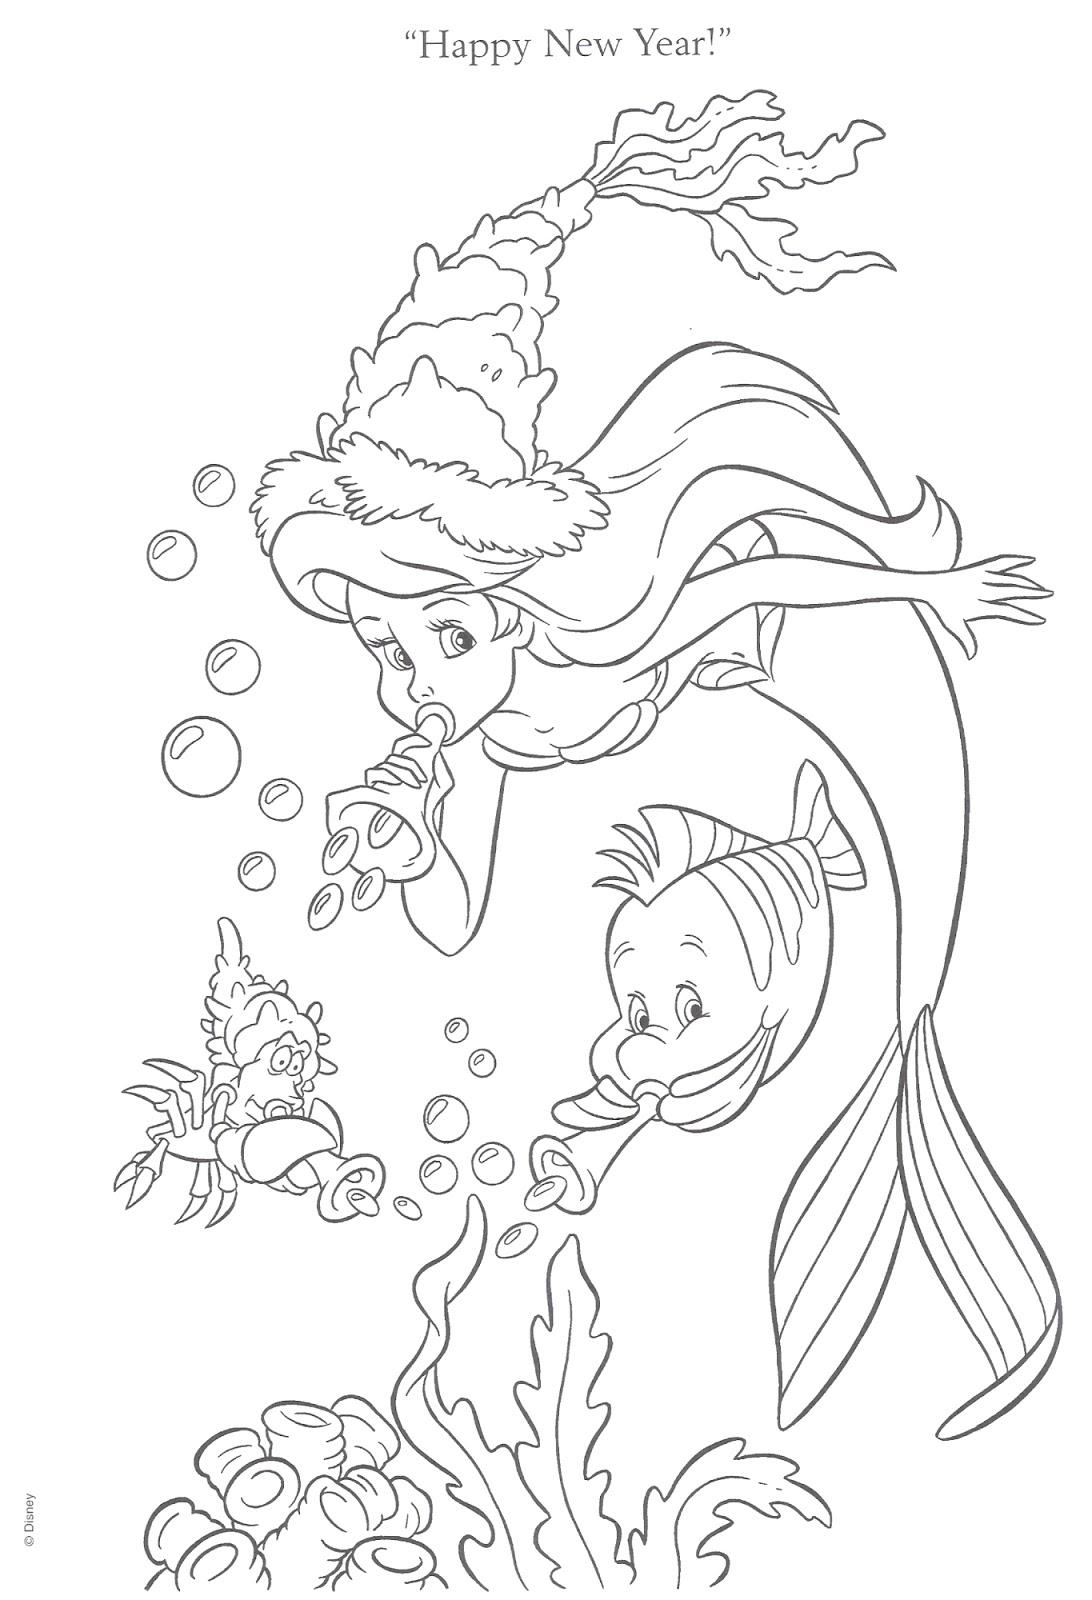 Imagenes Para Pintar Princesas Disney